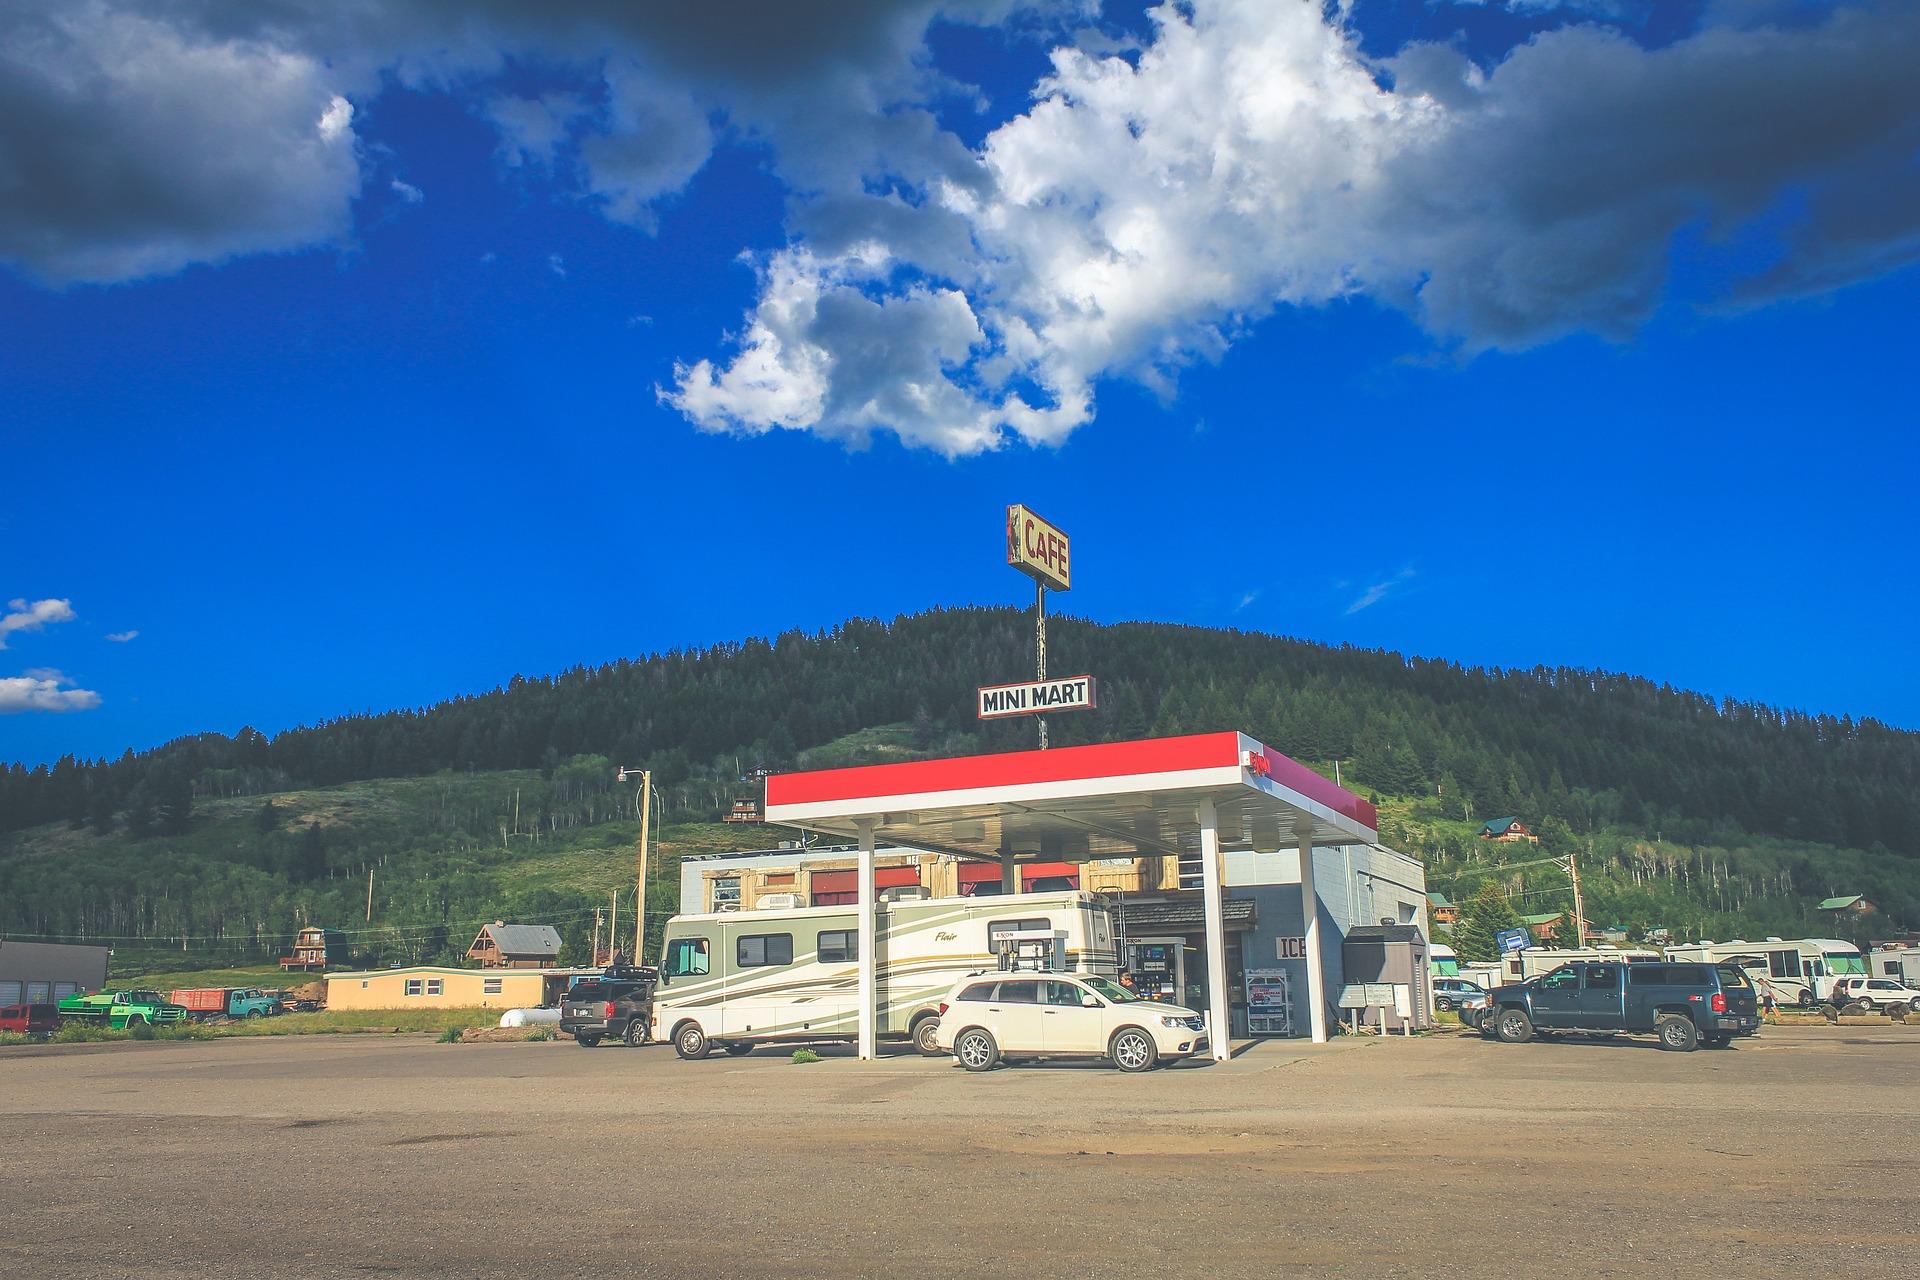 gas-station-863201_1920.jpg